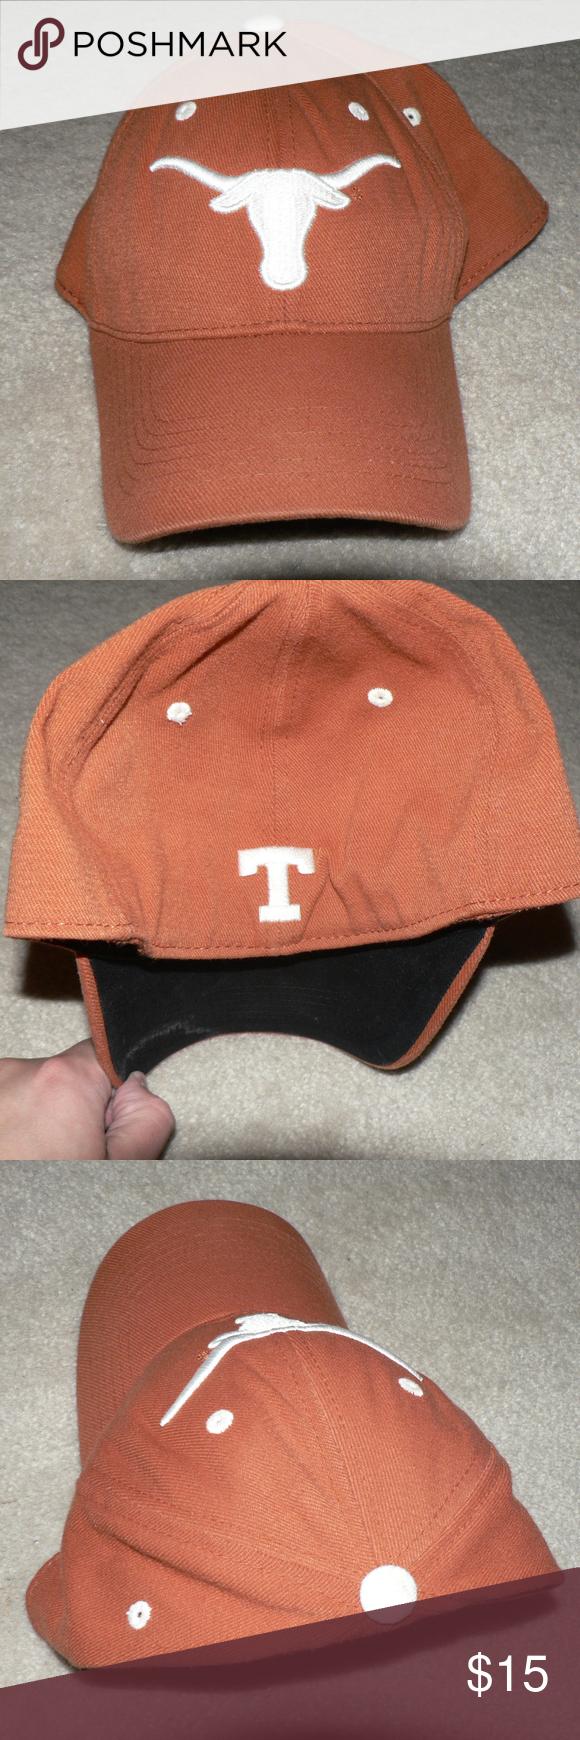 3f23b199ce045 Vintage Texas Longhorns Burnt Orange Baseball Hat Support your Longhorns  with this vintage ballcap! Has